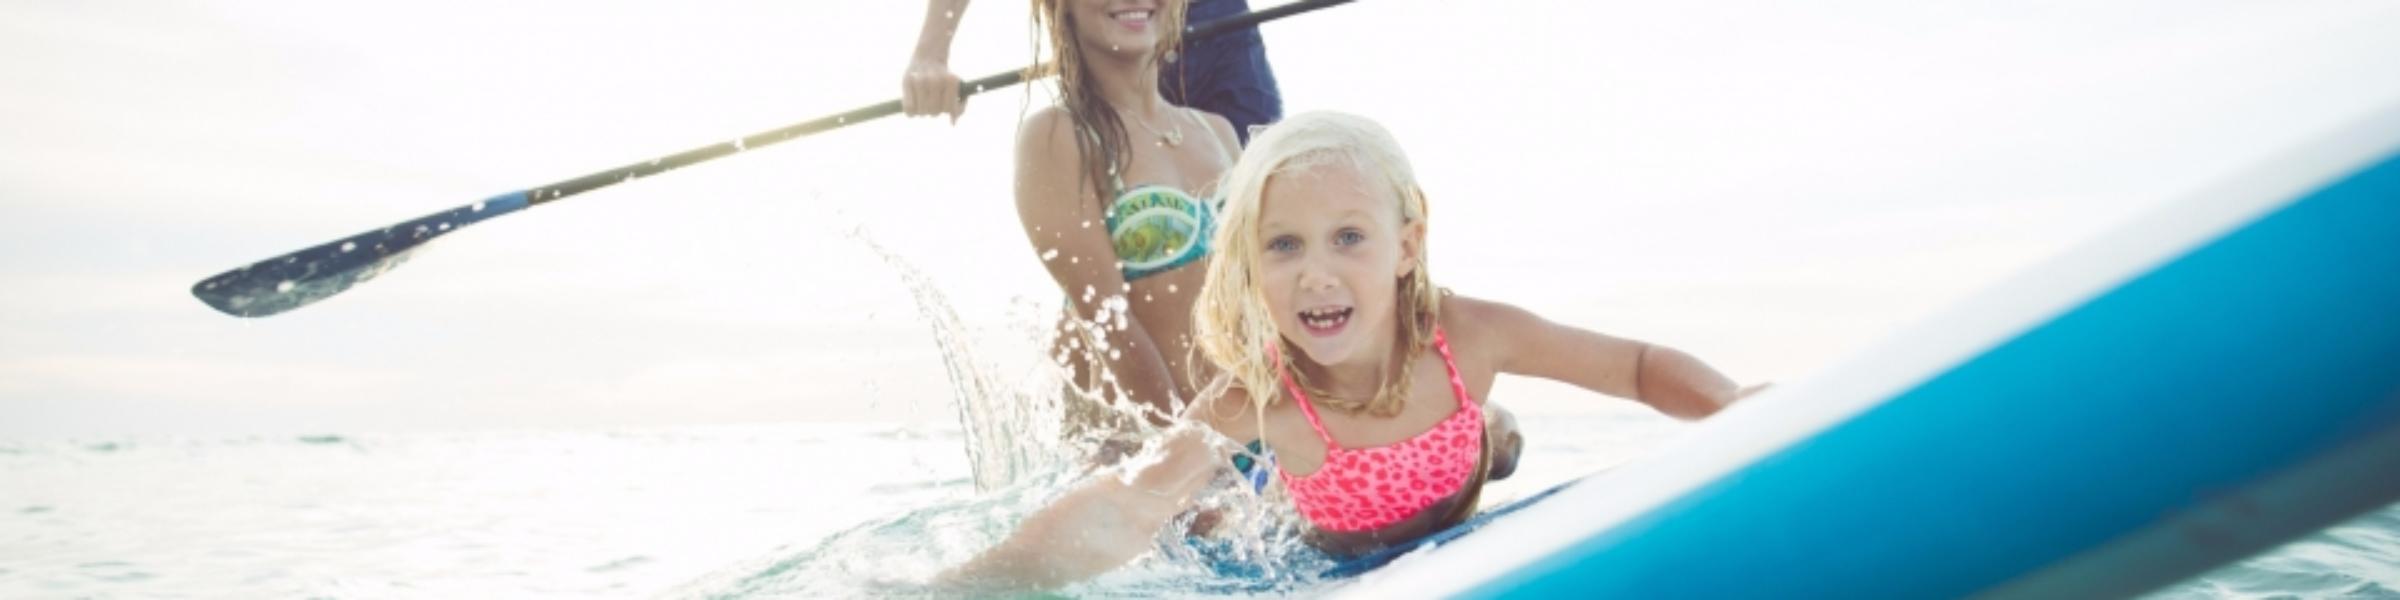 Family-Paddle-Surf-Ocean-960x300_c